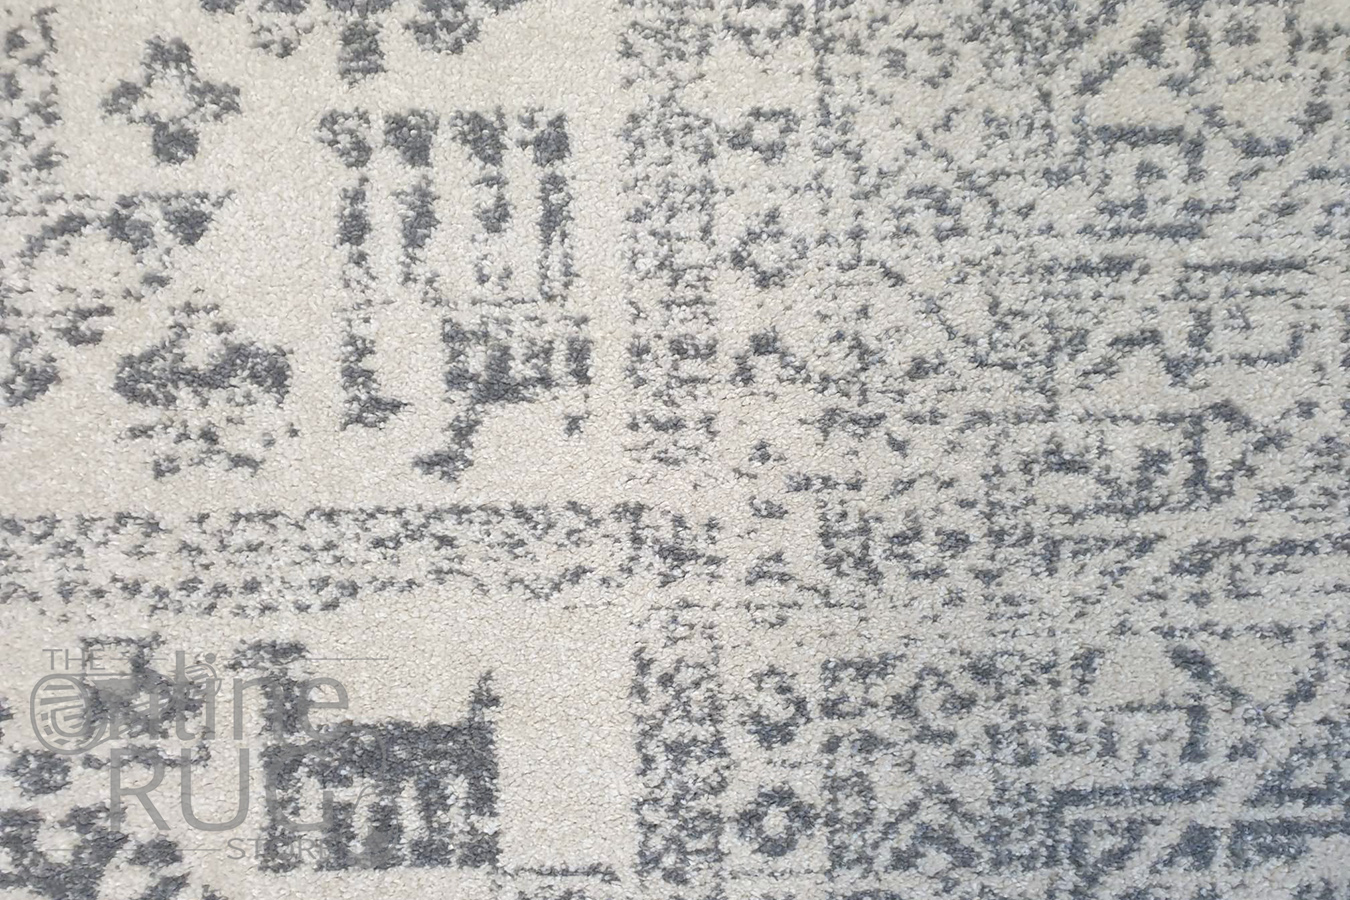 Cameron Silver Aztec Tribal Pattern Rug